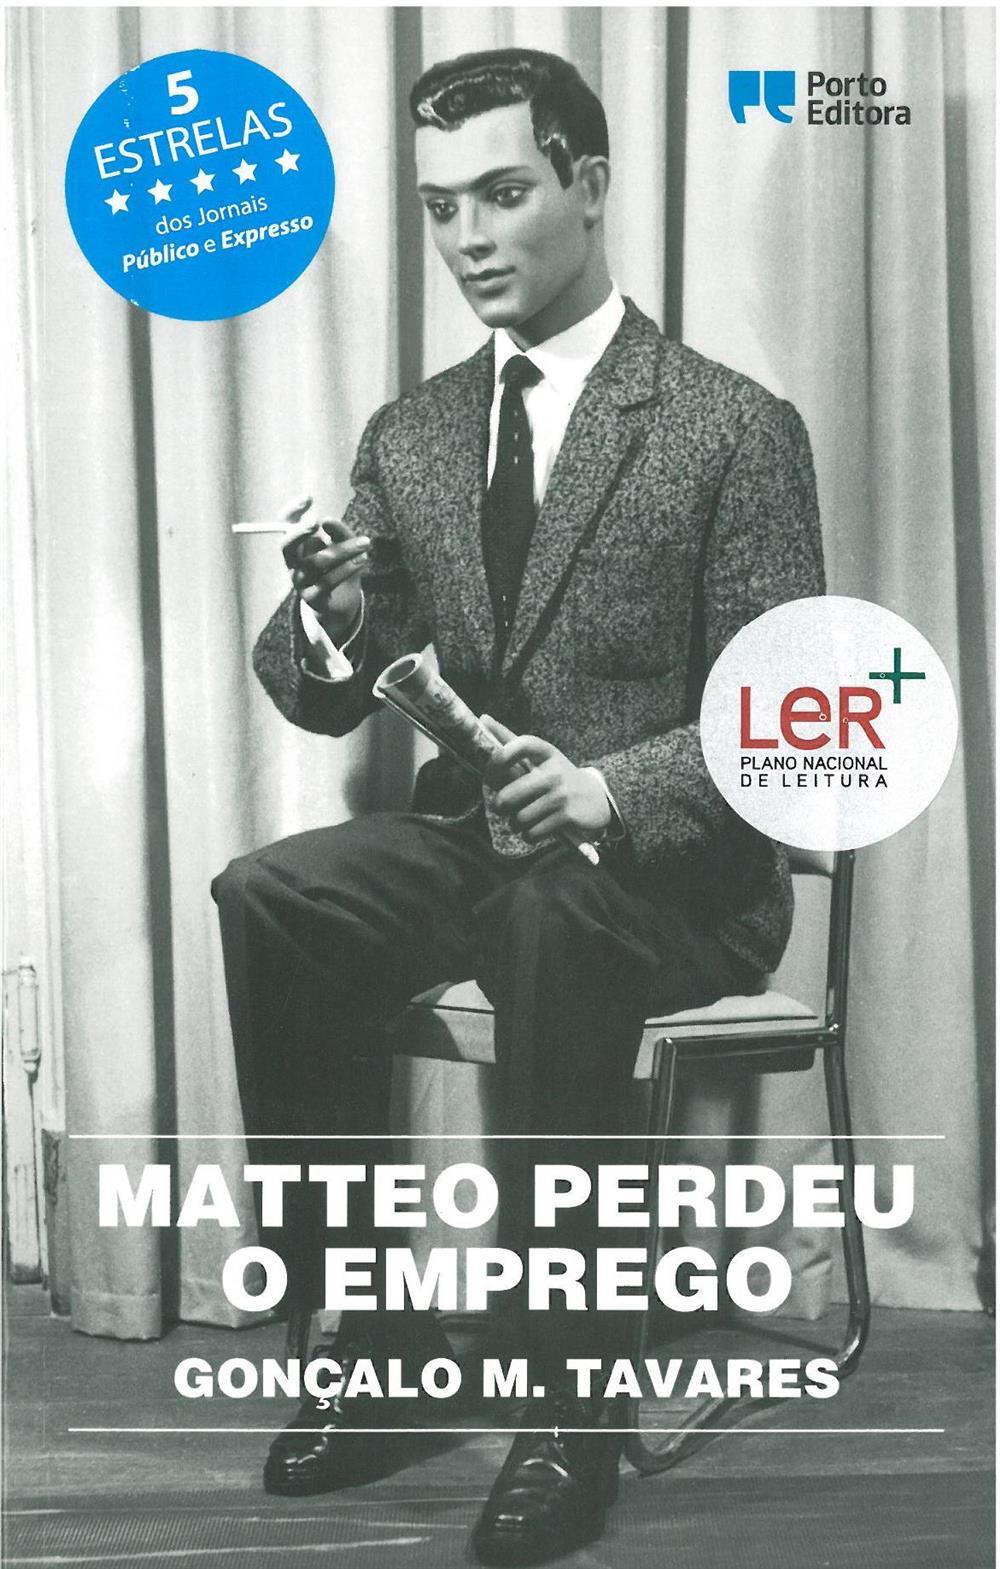 Matteo perdeu o emprego_.jpg